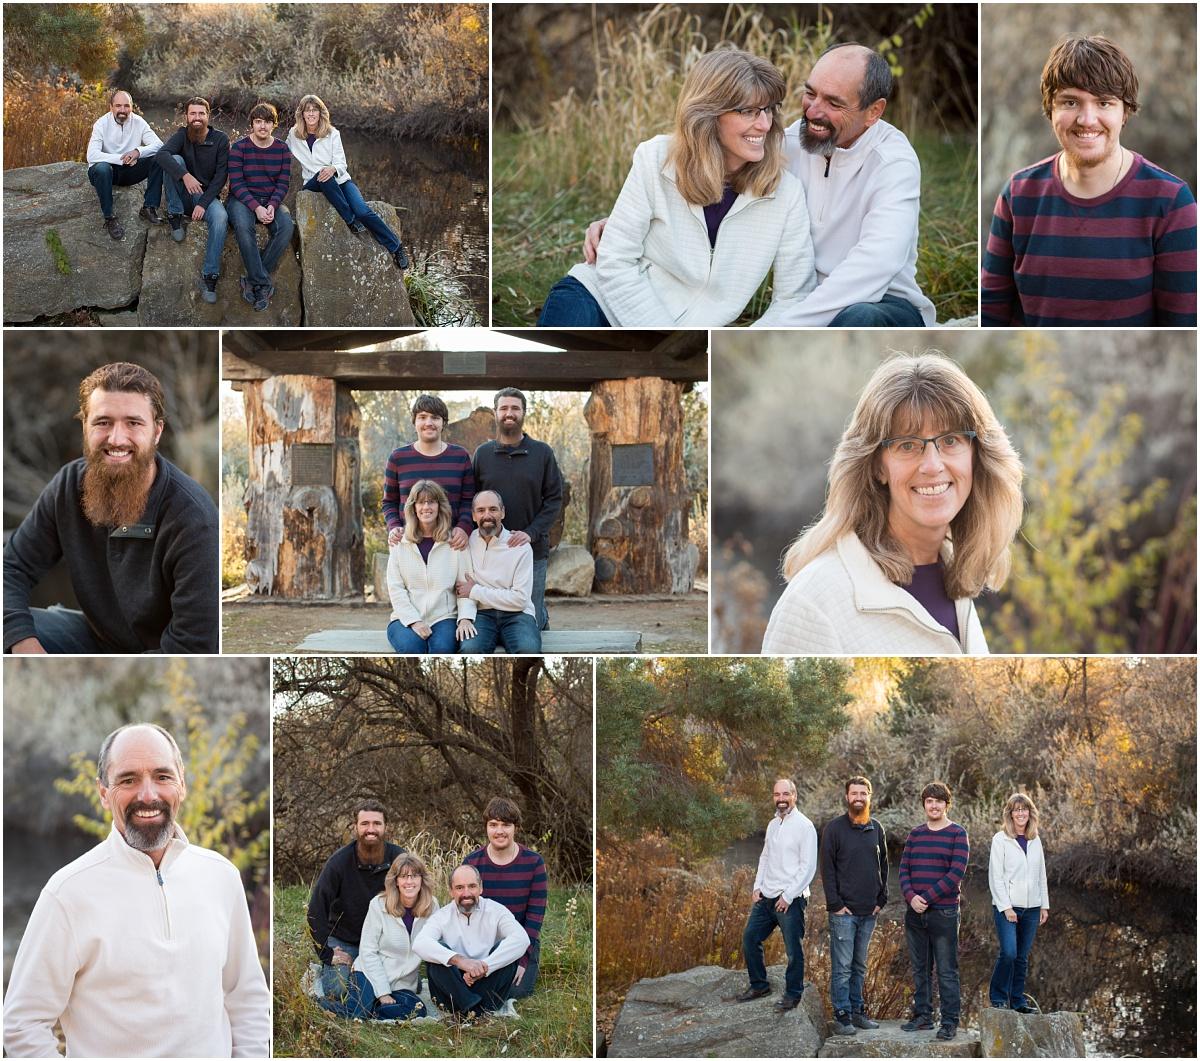 Family photography_Boise Idaho_Kathryn Albertson Park_Fall Leaves_Leah Southwick Photography_0027.jpg